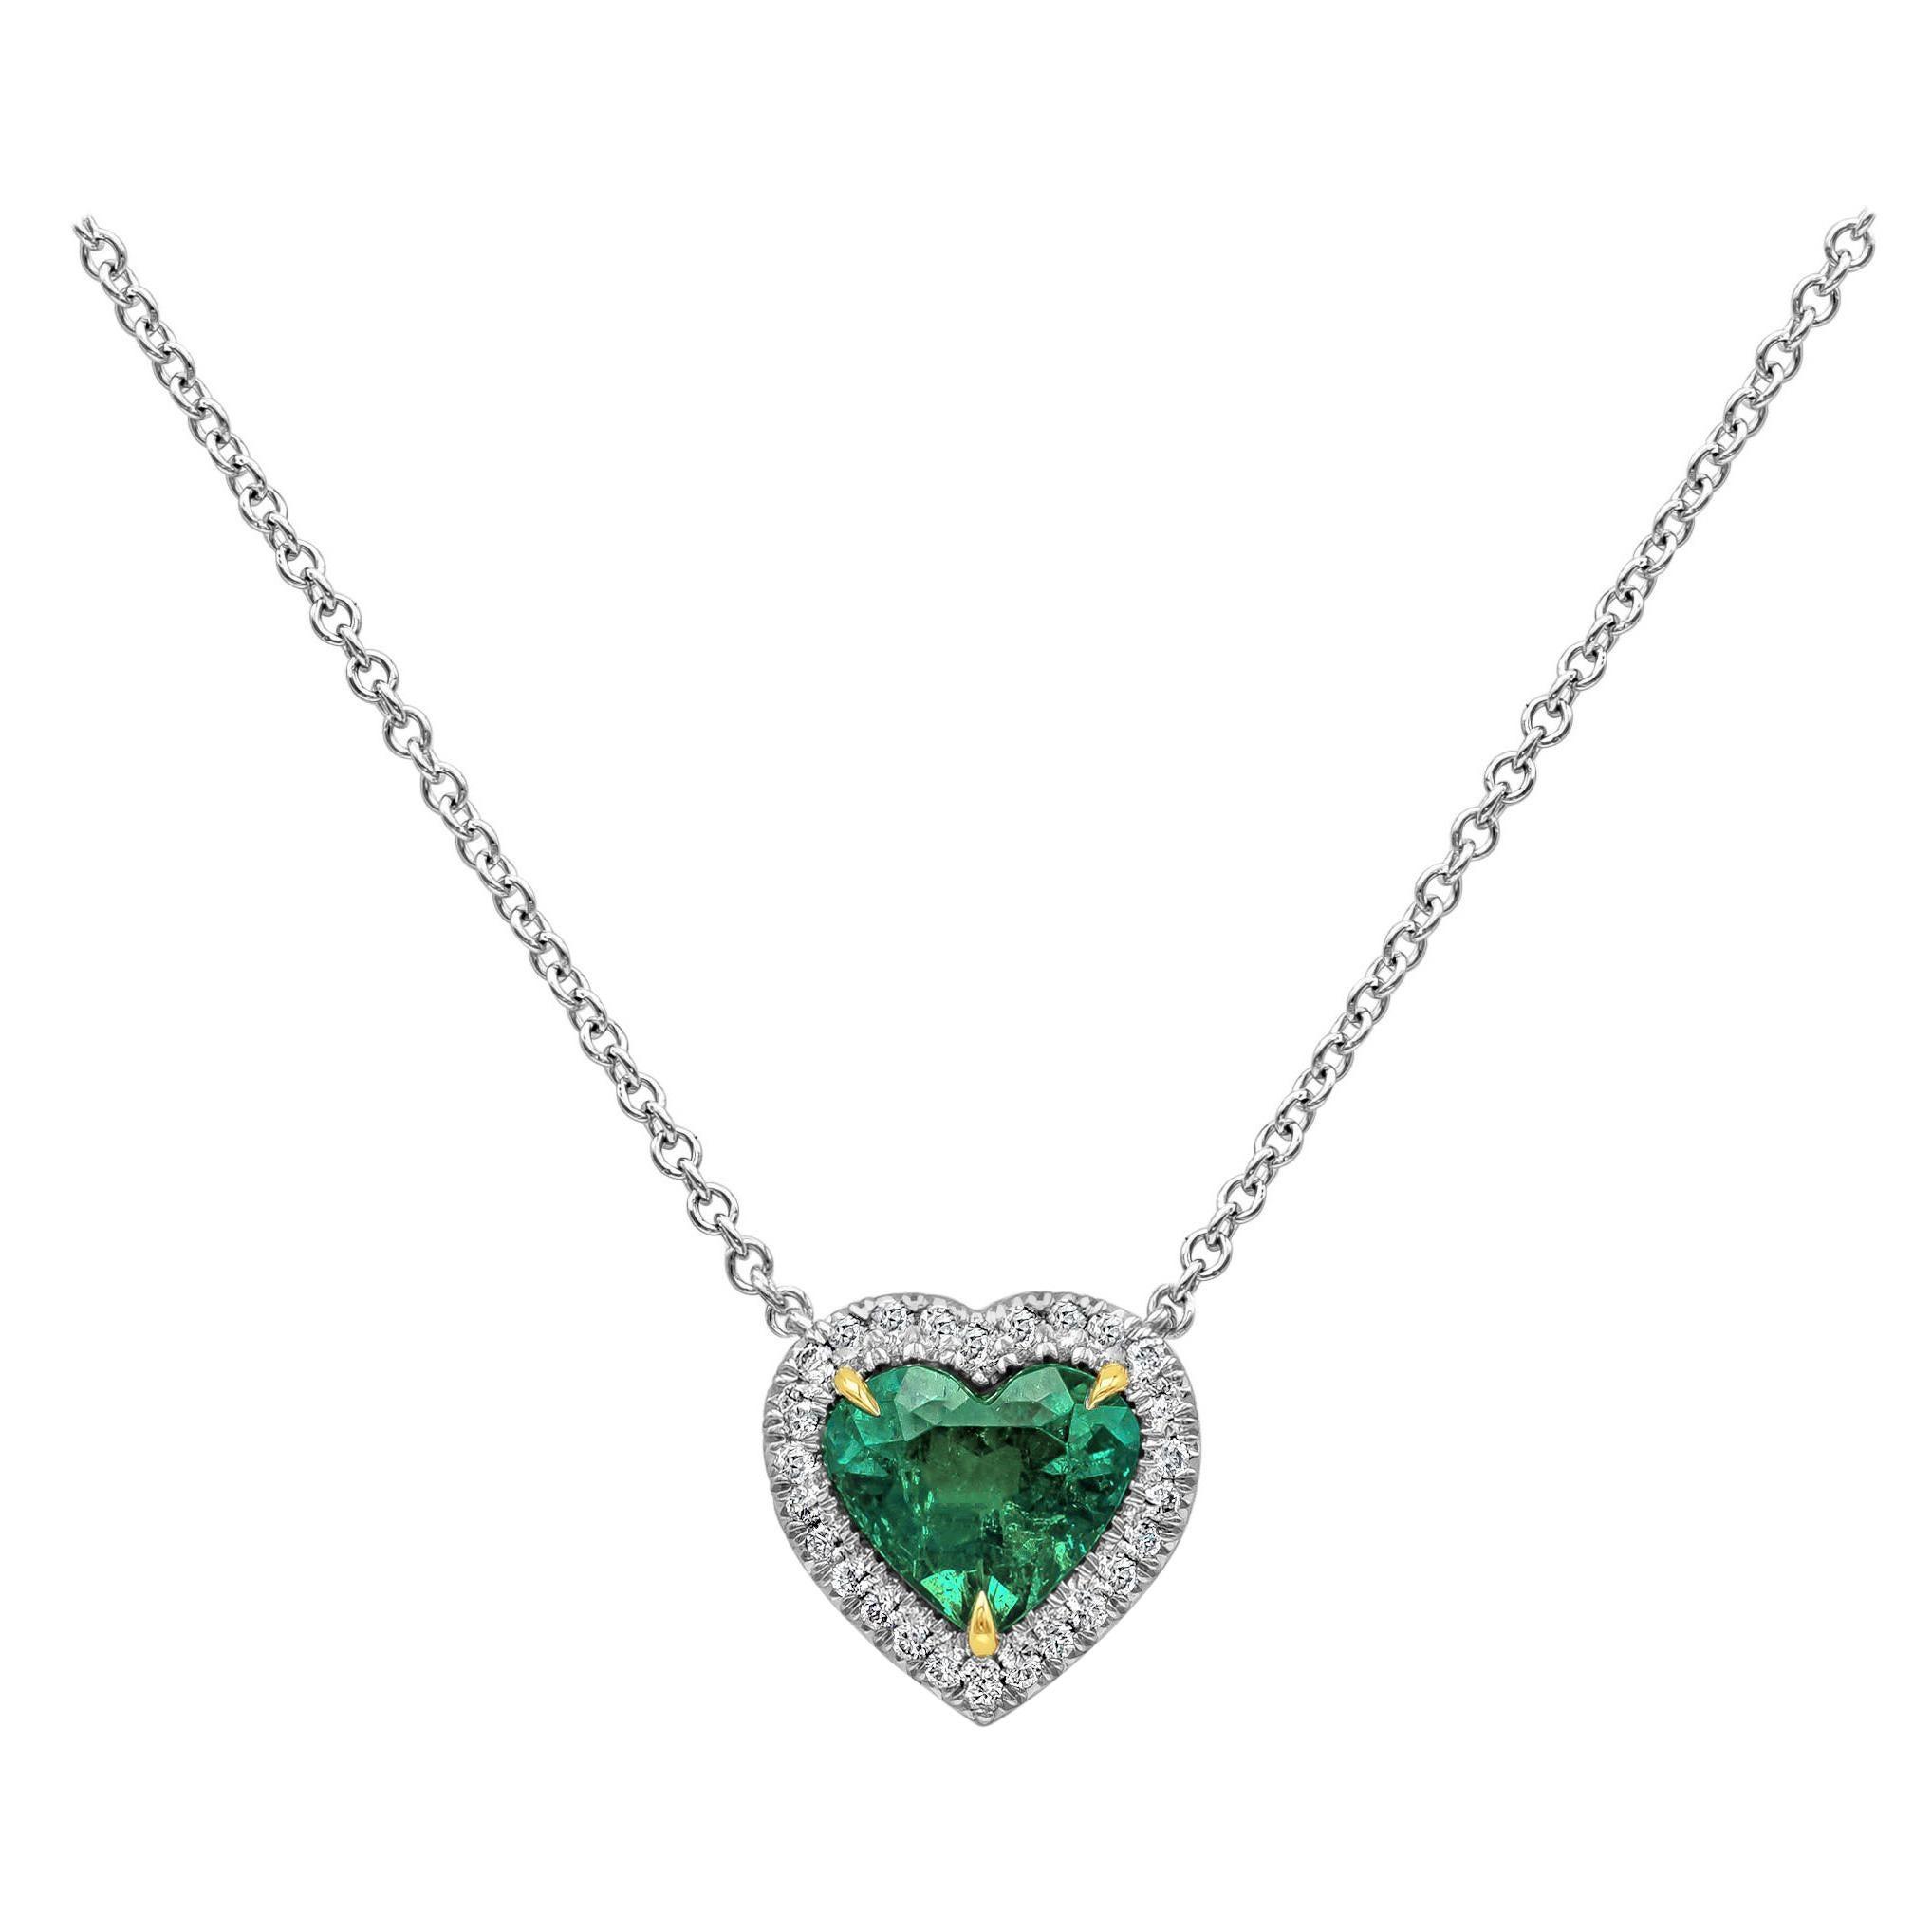 C. Dunaigre Certified Colombian Emerald and Diamond Halo Pendant Necklace